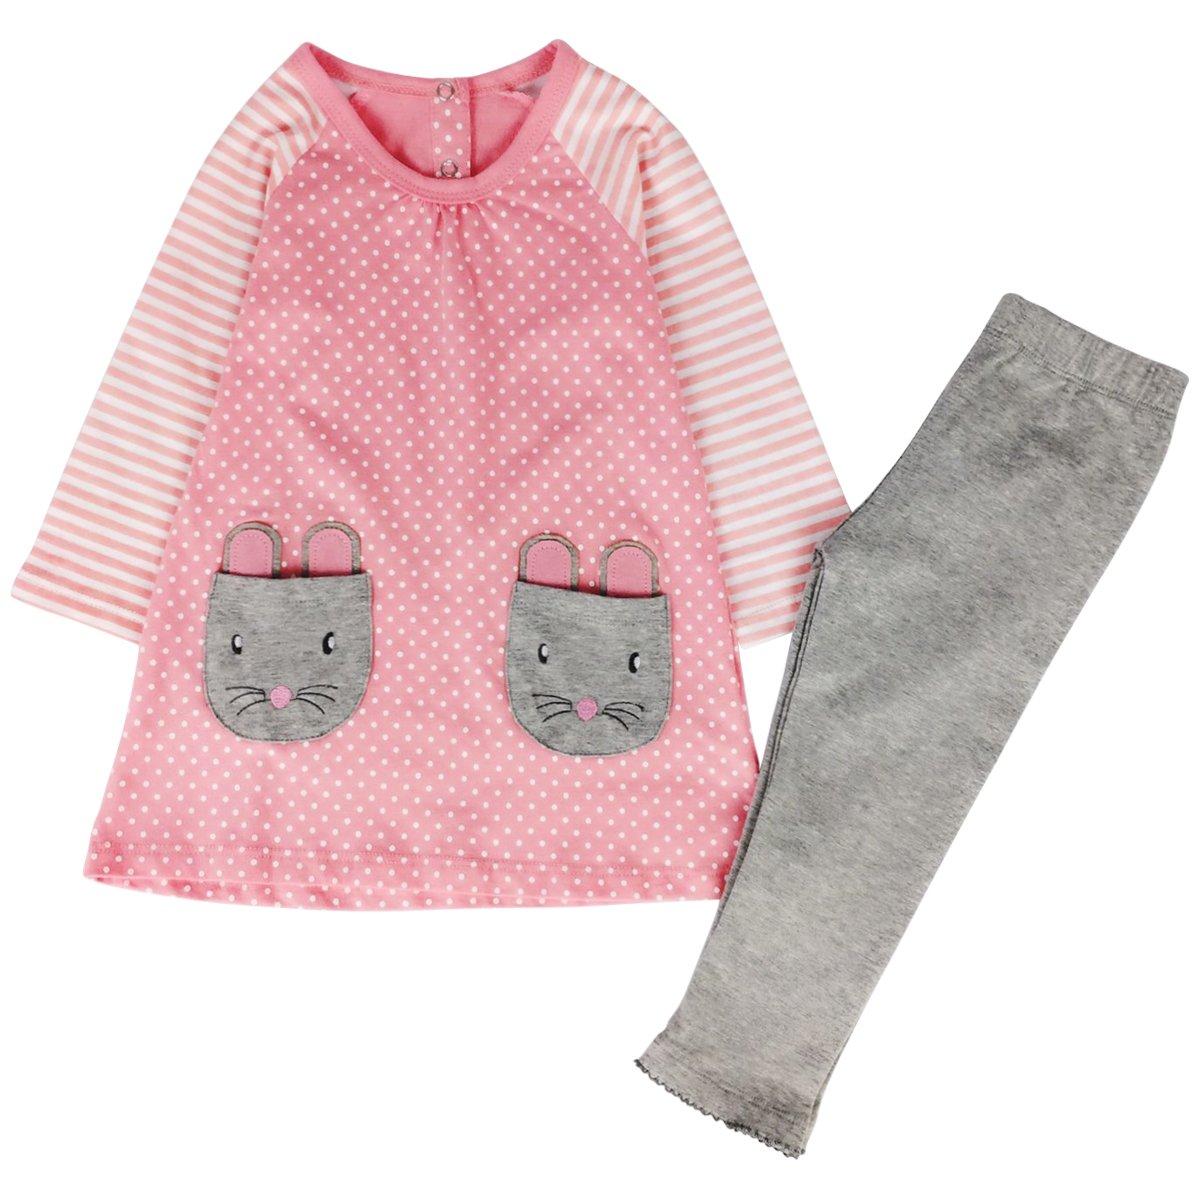 Jastore Kids Girl Cute 2PCS Striped Clothing Set Long Sleeve Top +Leggings Outfits